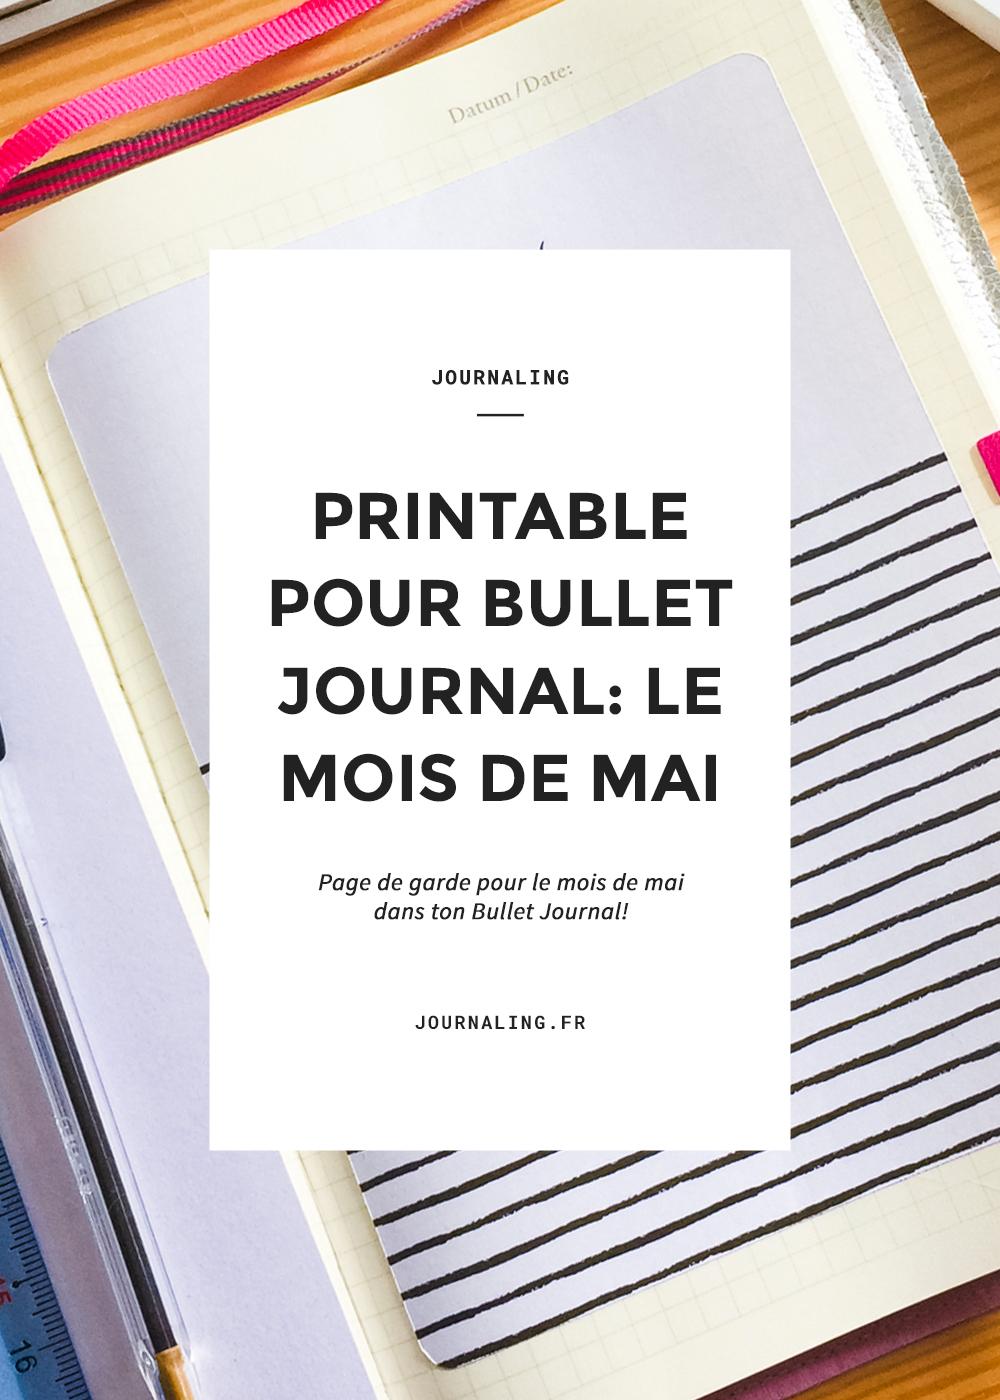 Printable Bullet Journal: le mois de mai